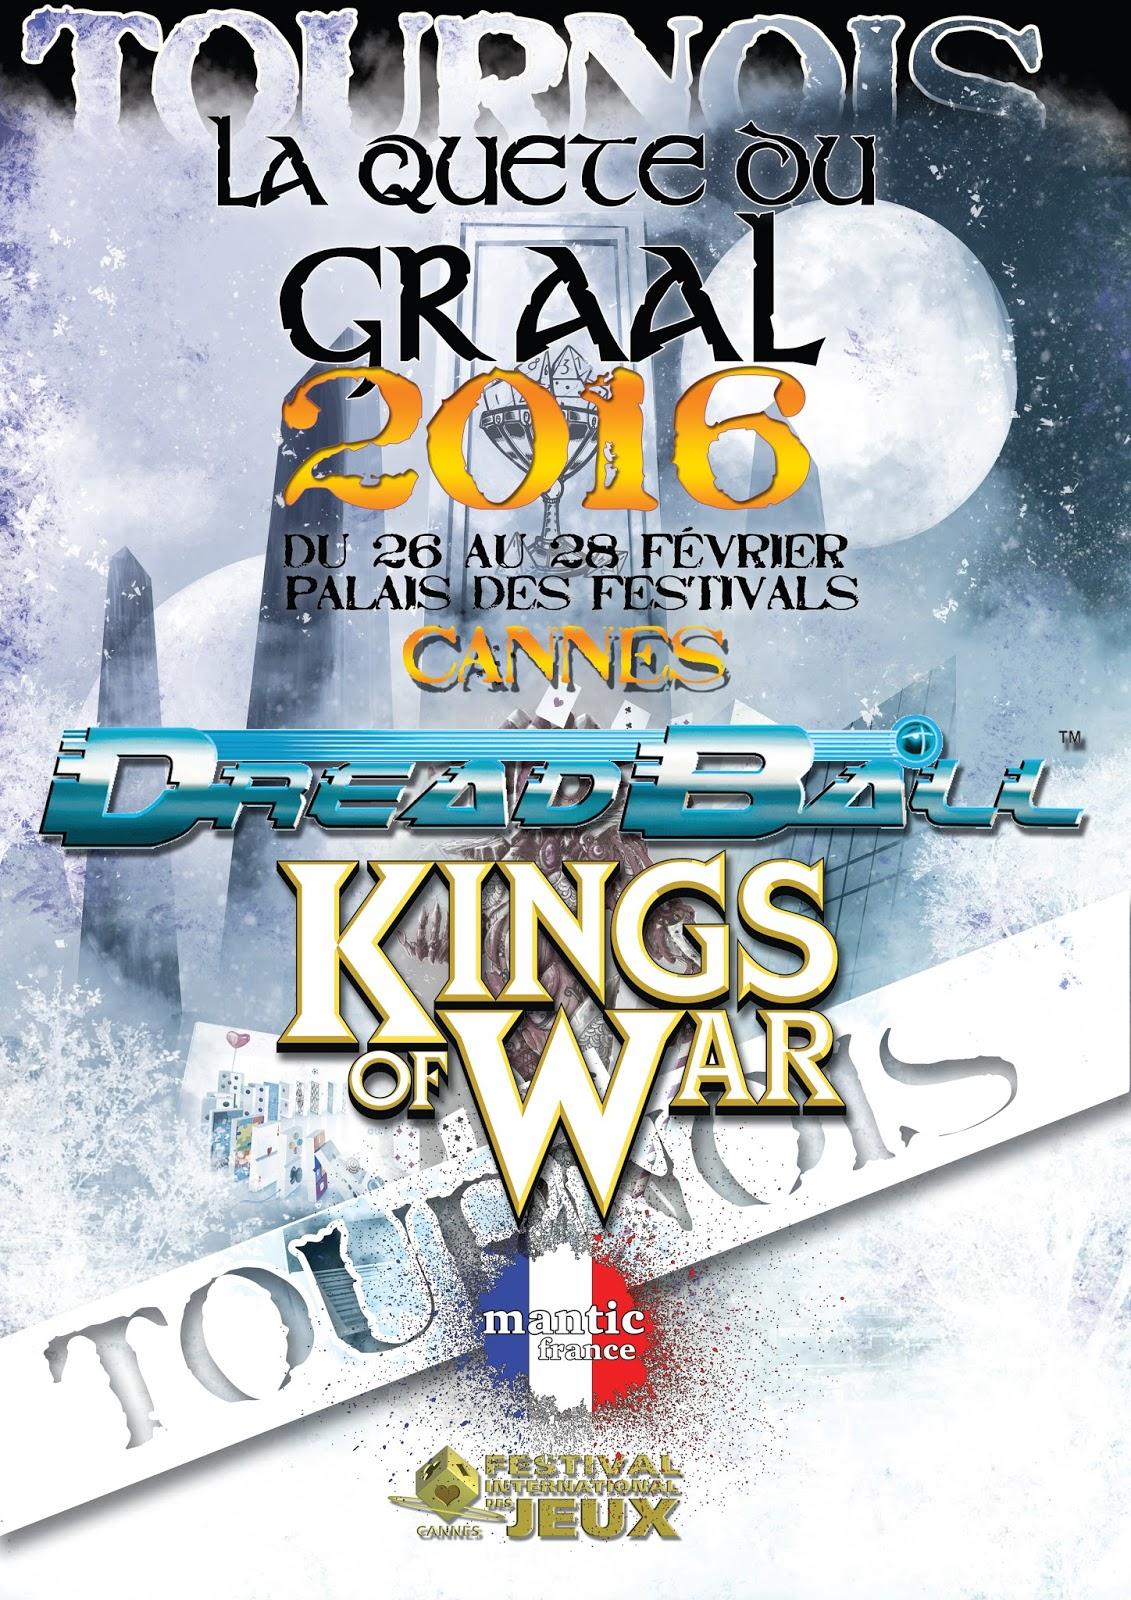 [KoW][06] Tournoi King of War du Festival des jeux Affiche%2Bgraal%2Btournois%2Bfigurines